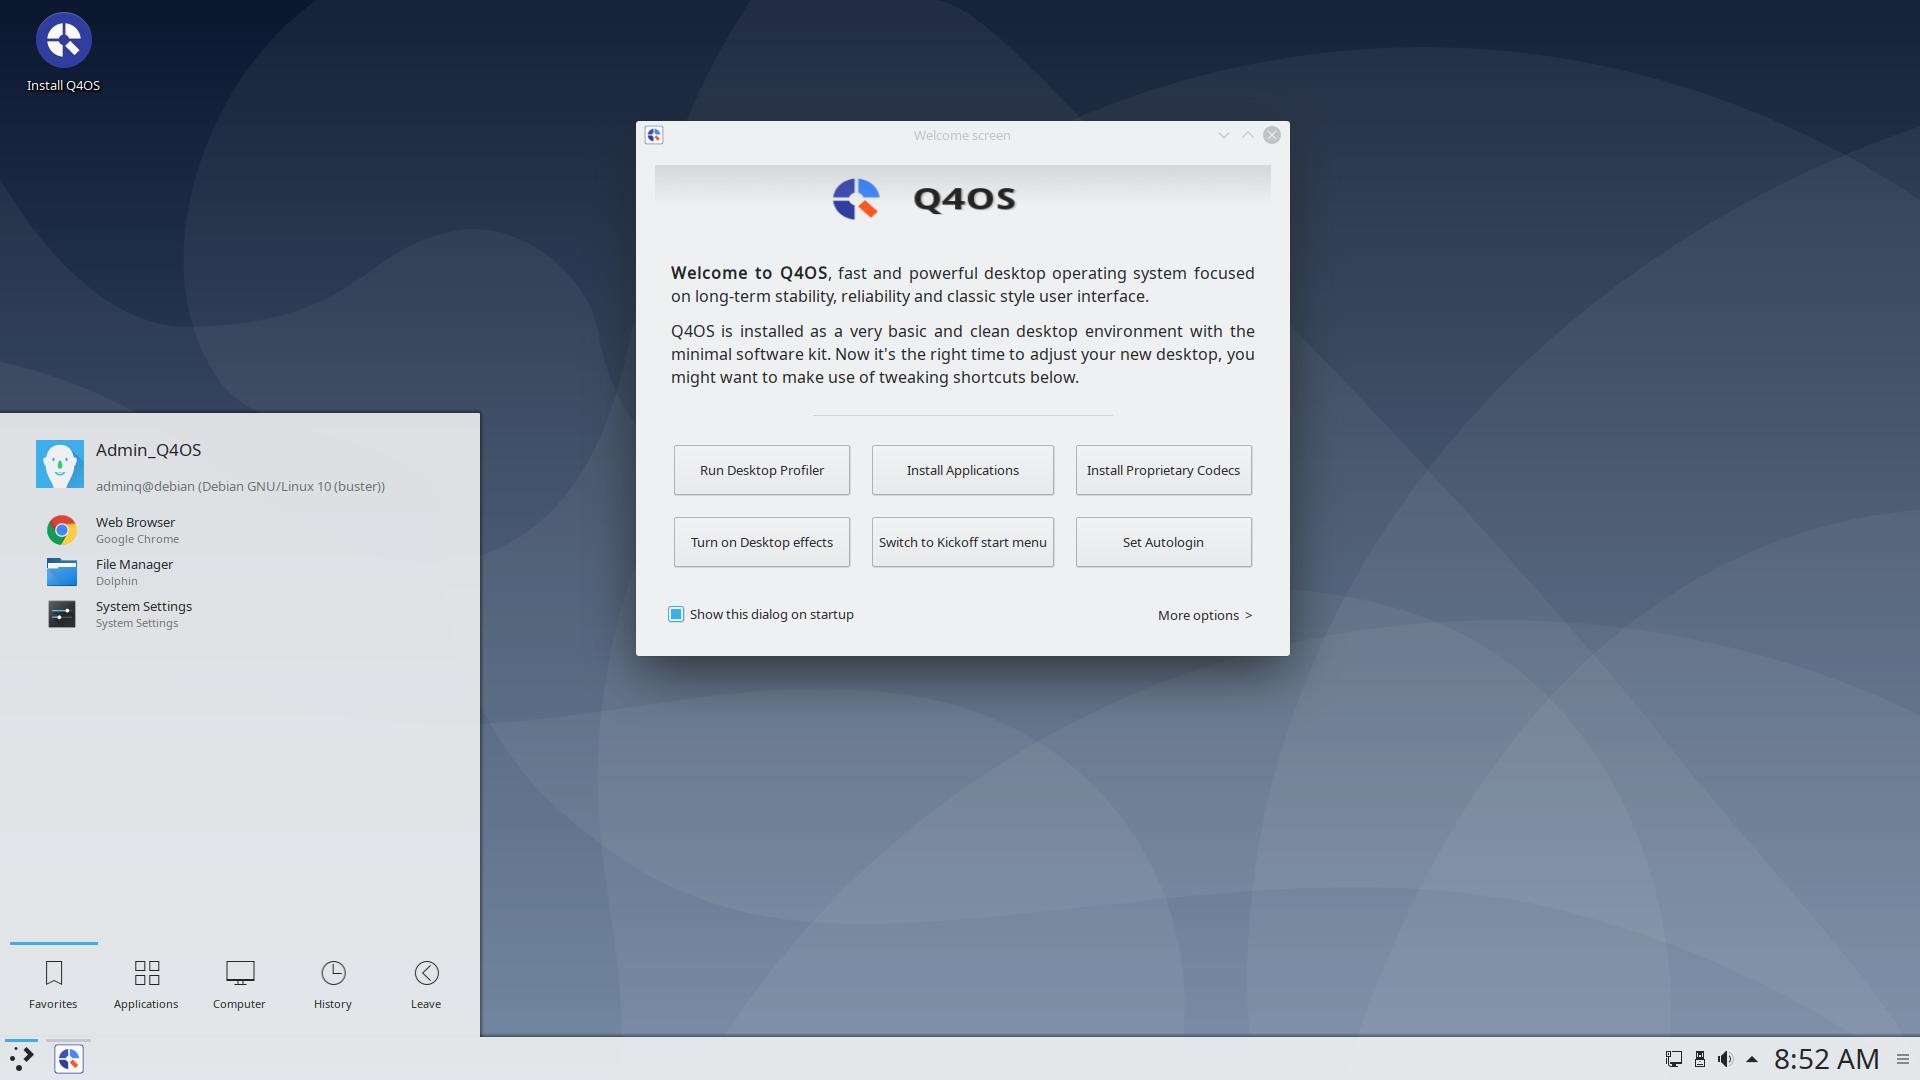 Q4os Desktop Operating System